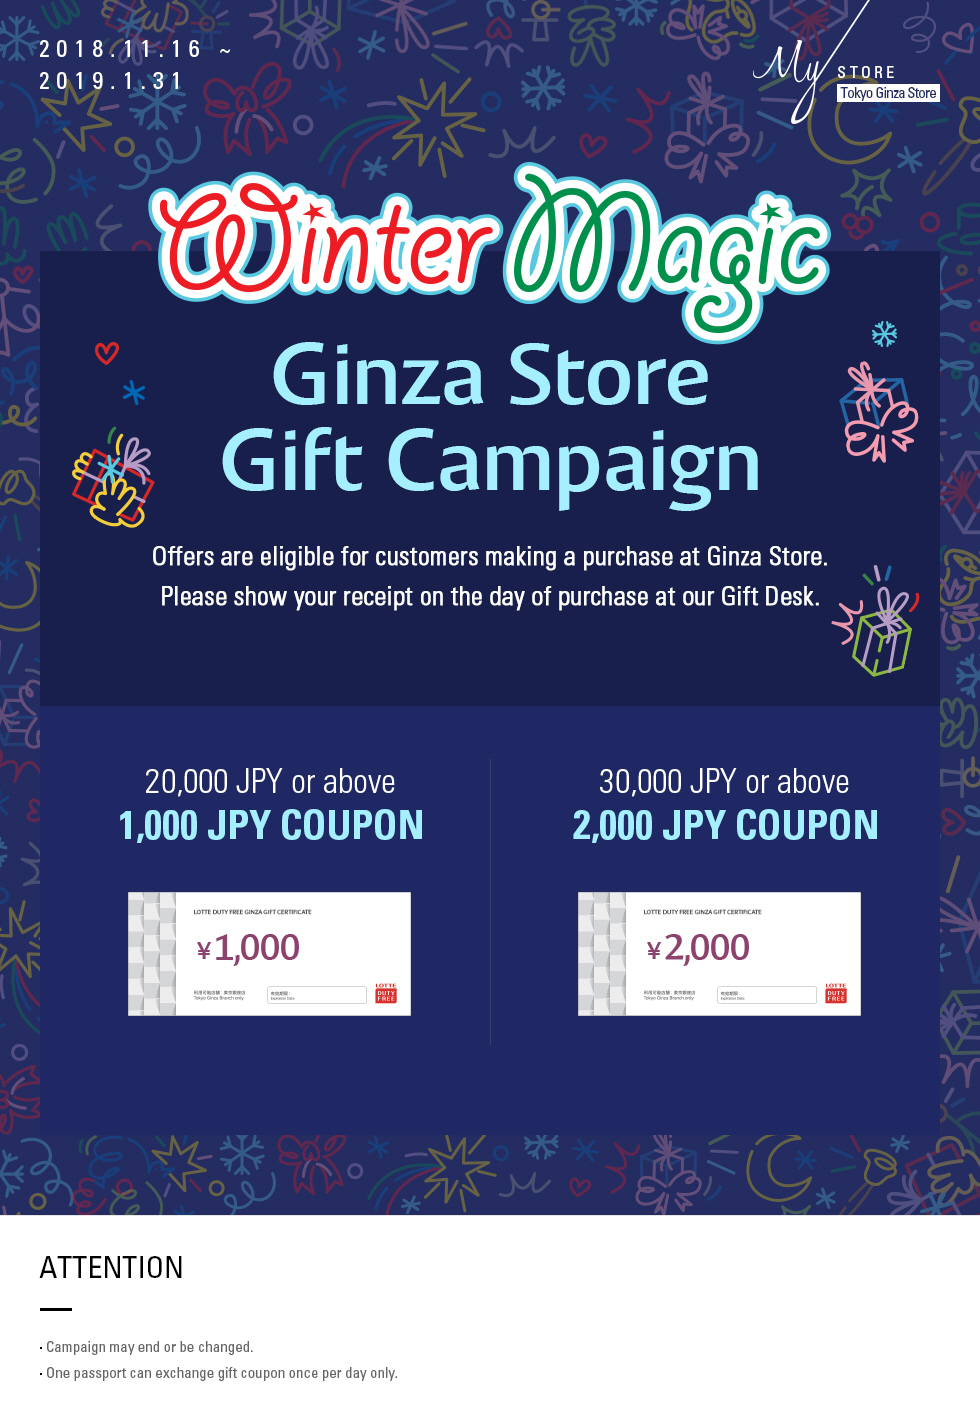 Tokyo Ginza Store Winter Magic